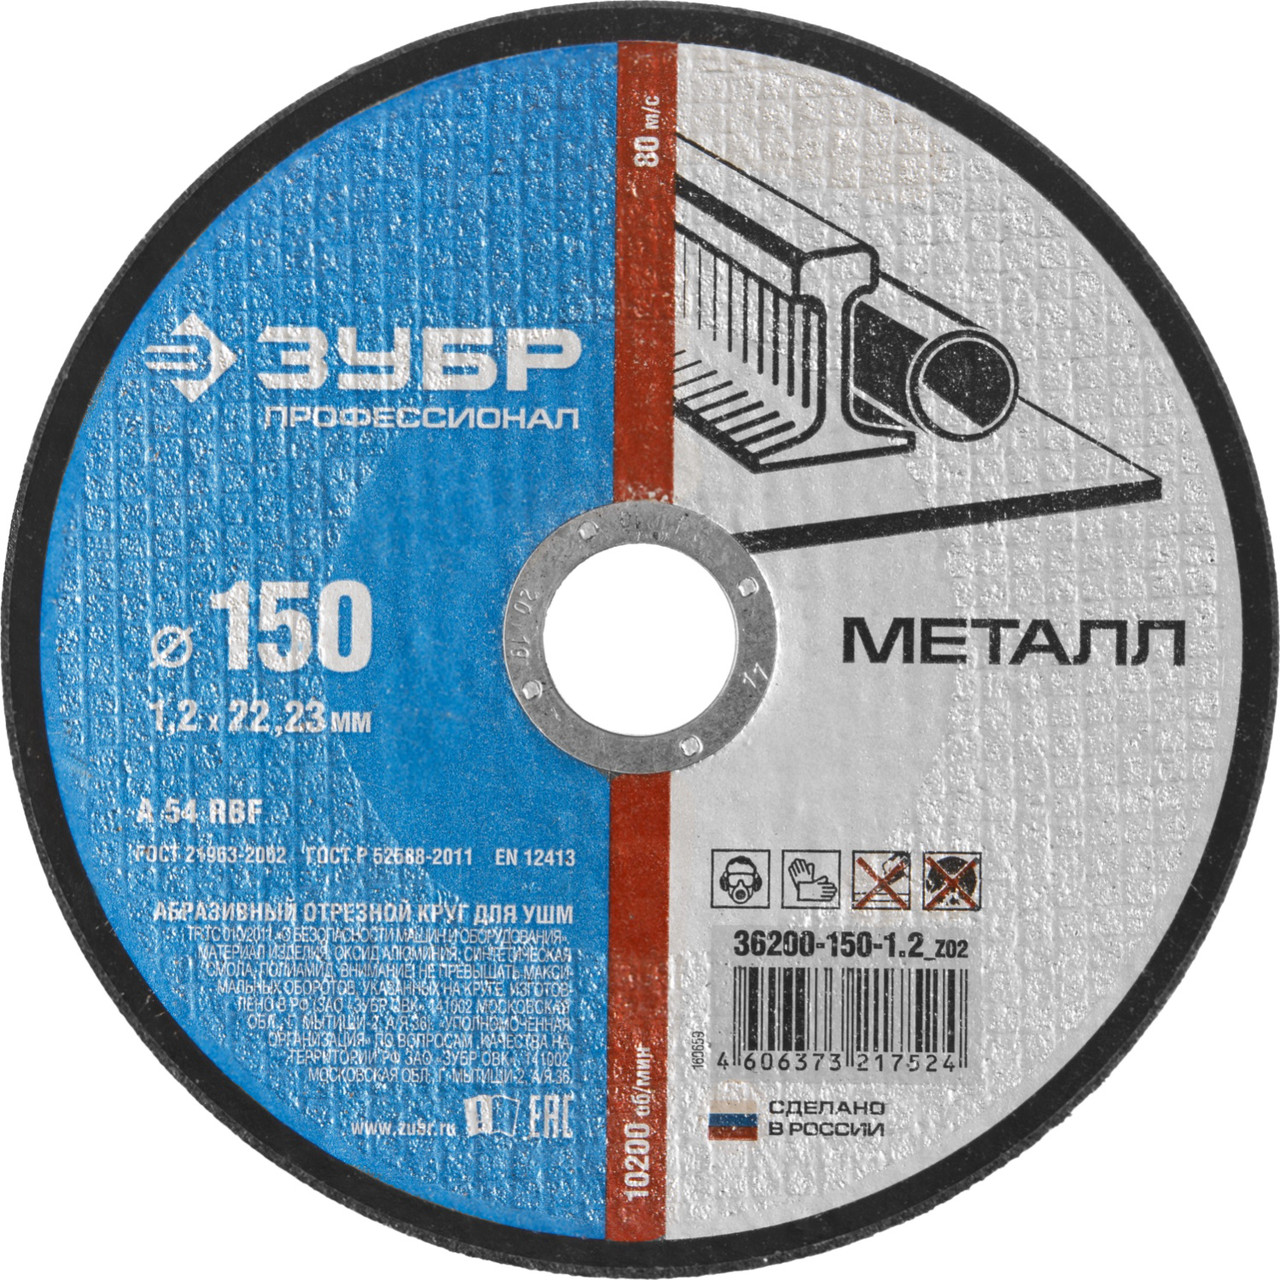 (36200-150-1.2) Круг отрезной абразивный ЗУБР по металлу, для УШМ, 150х1,2х22,2мм